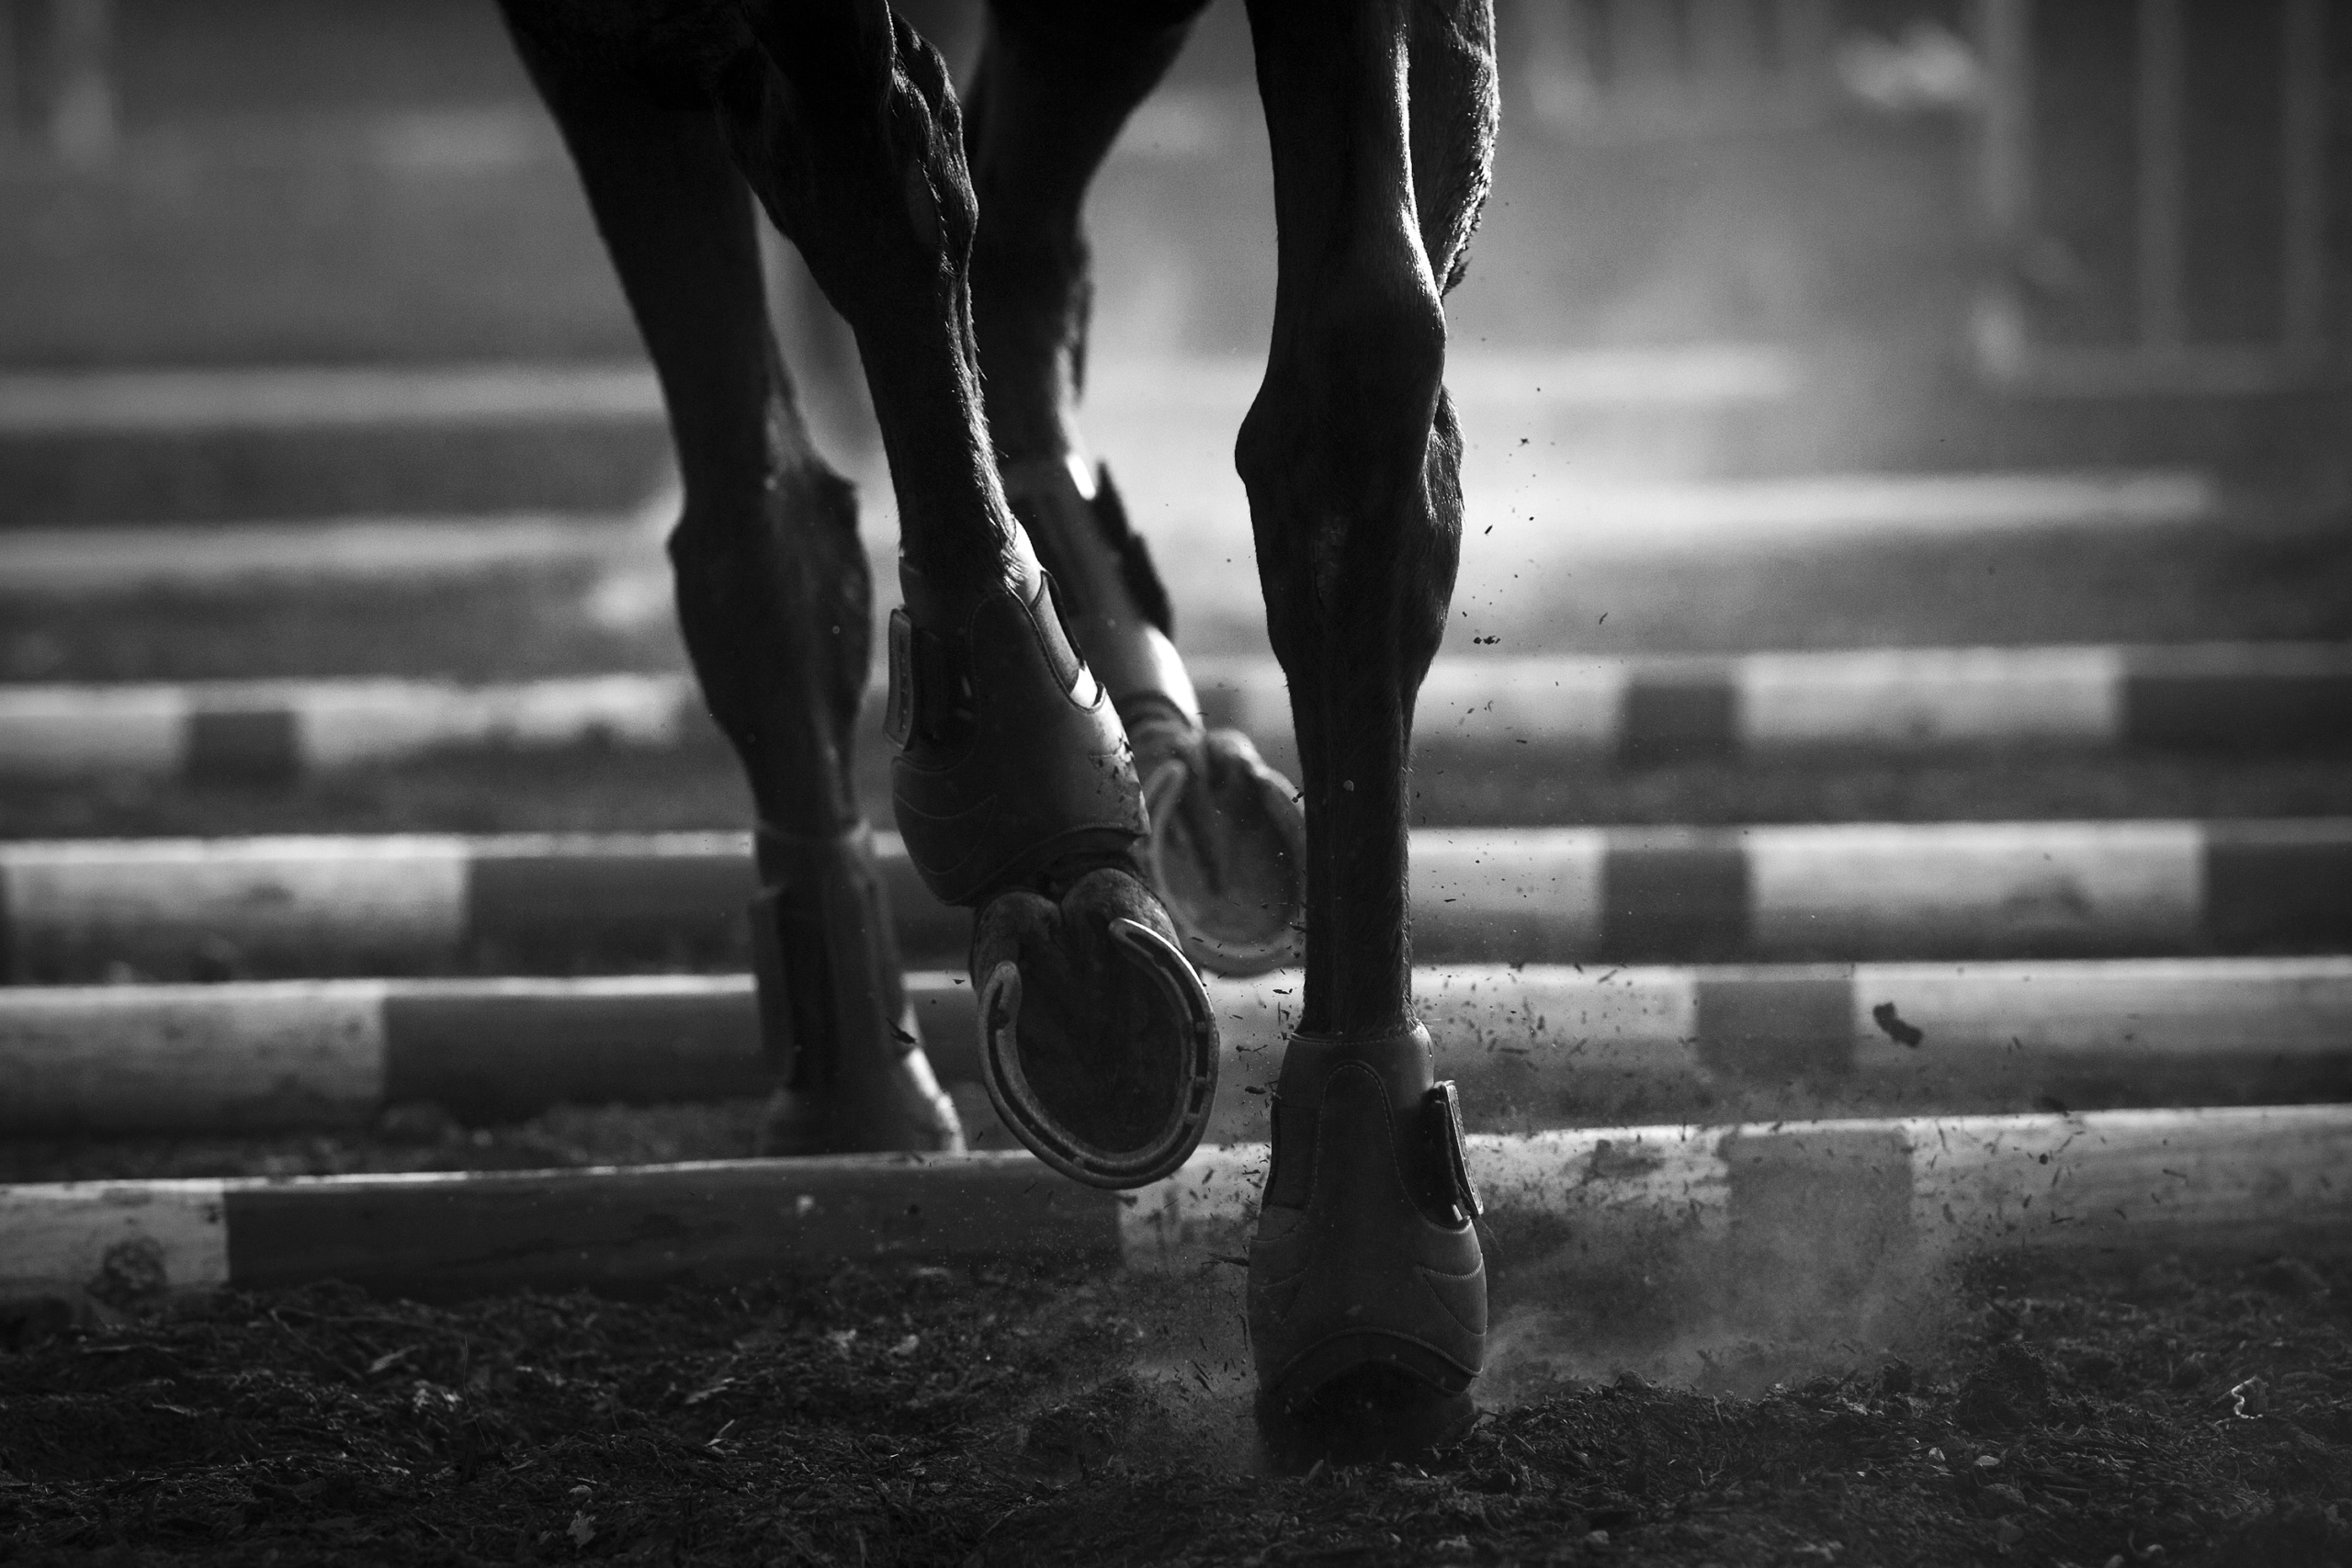 EQUESTRIANCampaign realized for the International Federation for Equestrian Sports FEI.FEI Solidarity Program.Kiara farms Zambia